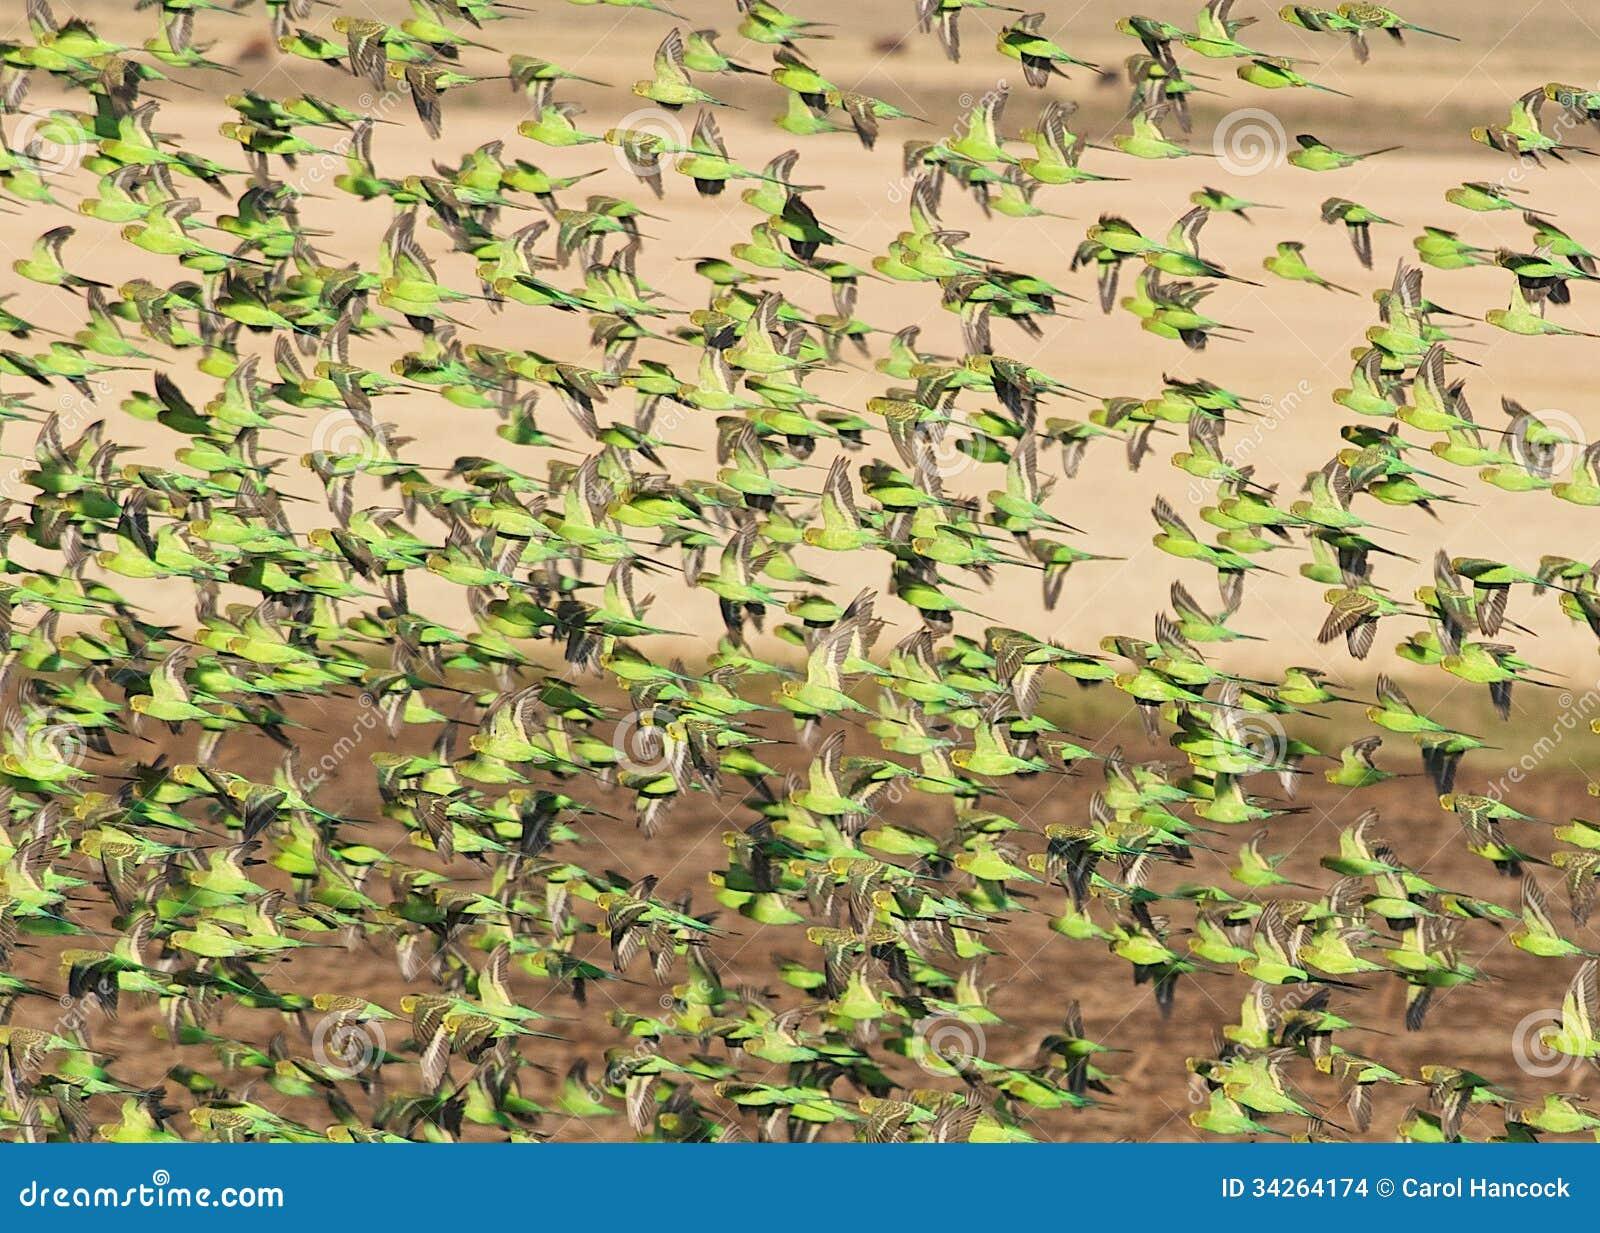 Wild Budgies In Queensland Australia Stock Images - Image: 34264174